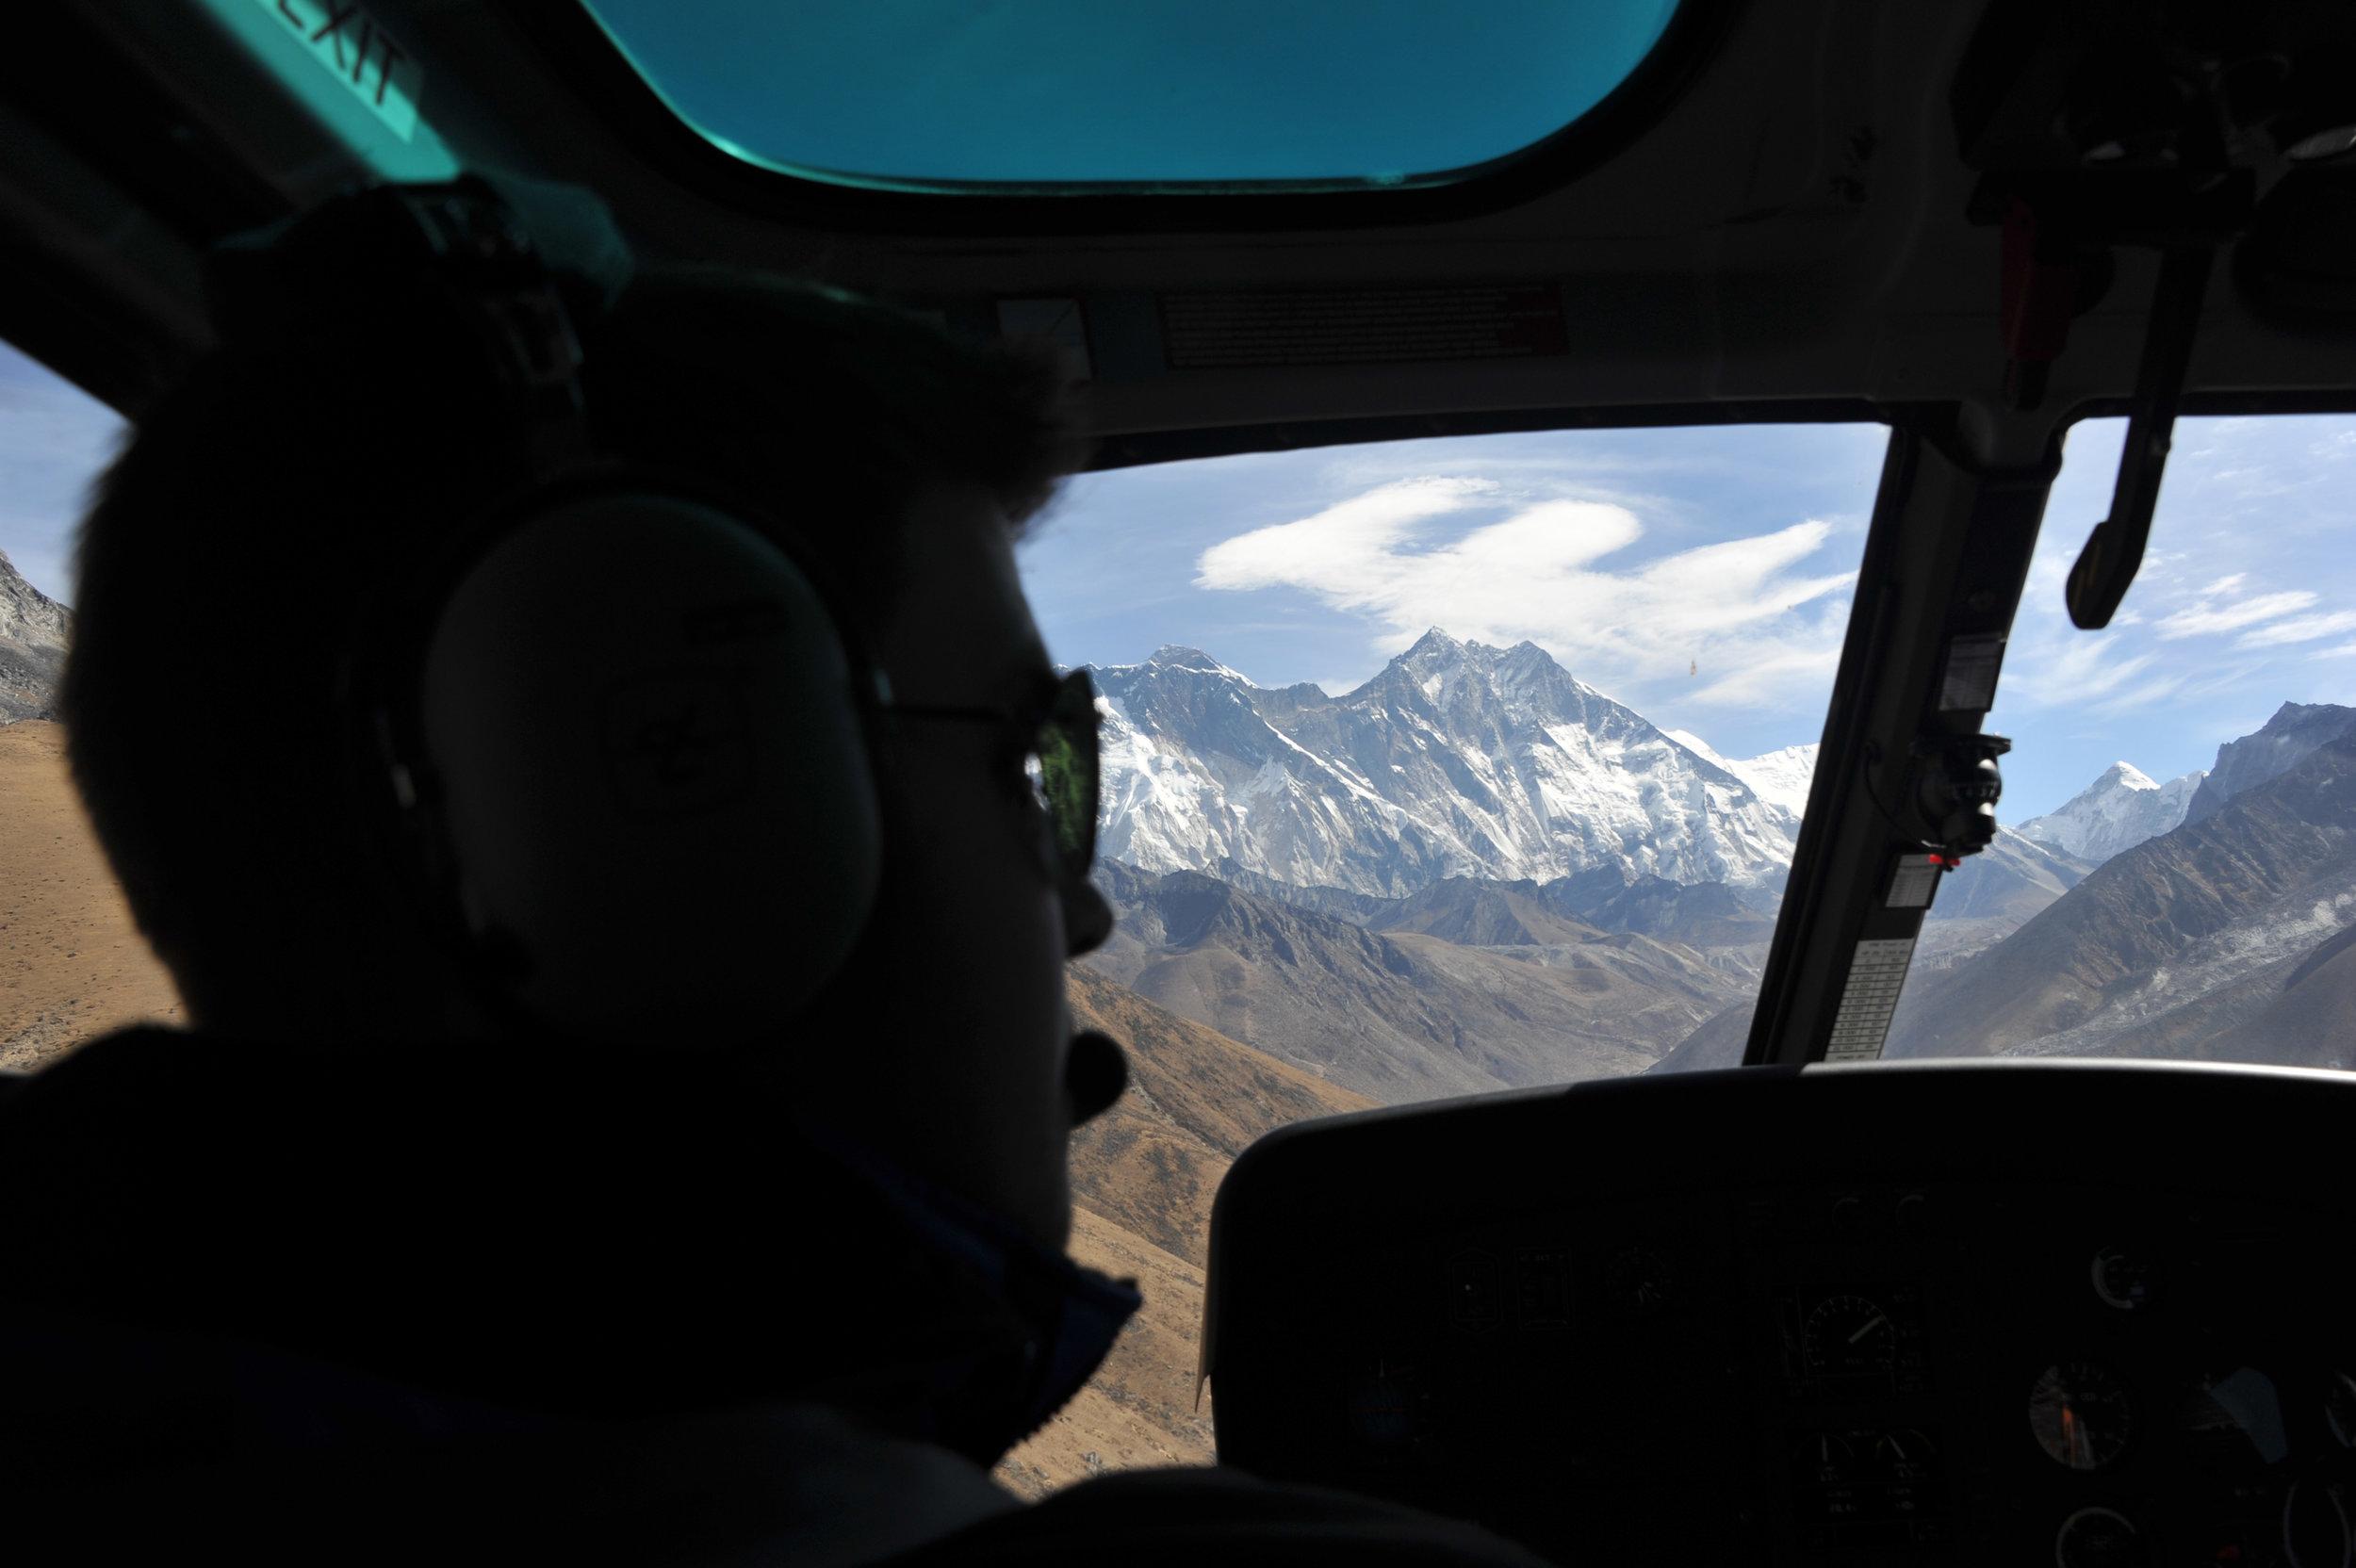 mck nepal 2016 cockpit DSC_6756.jpg